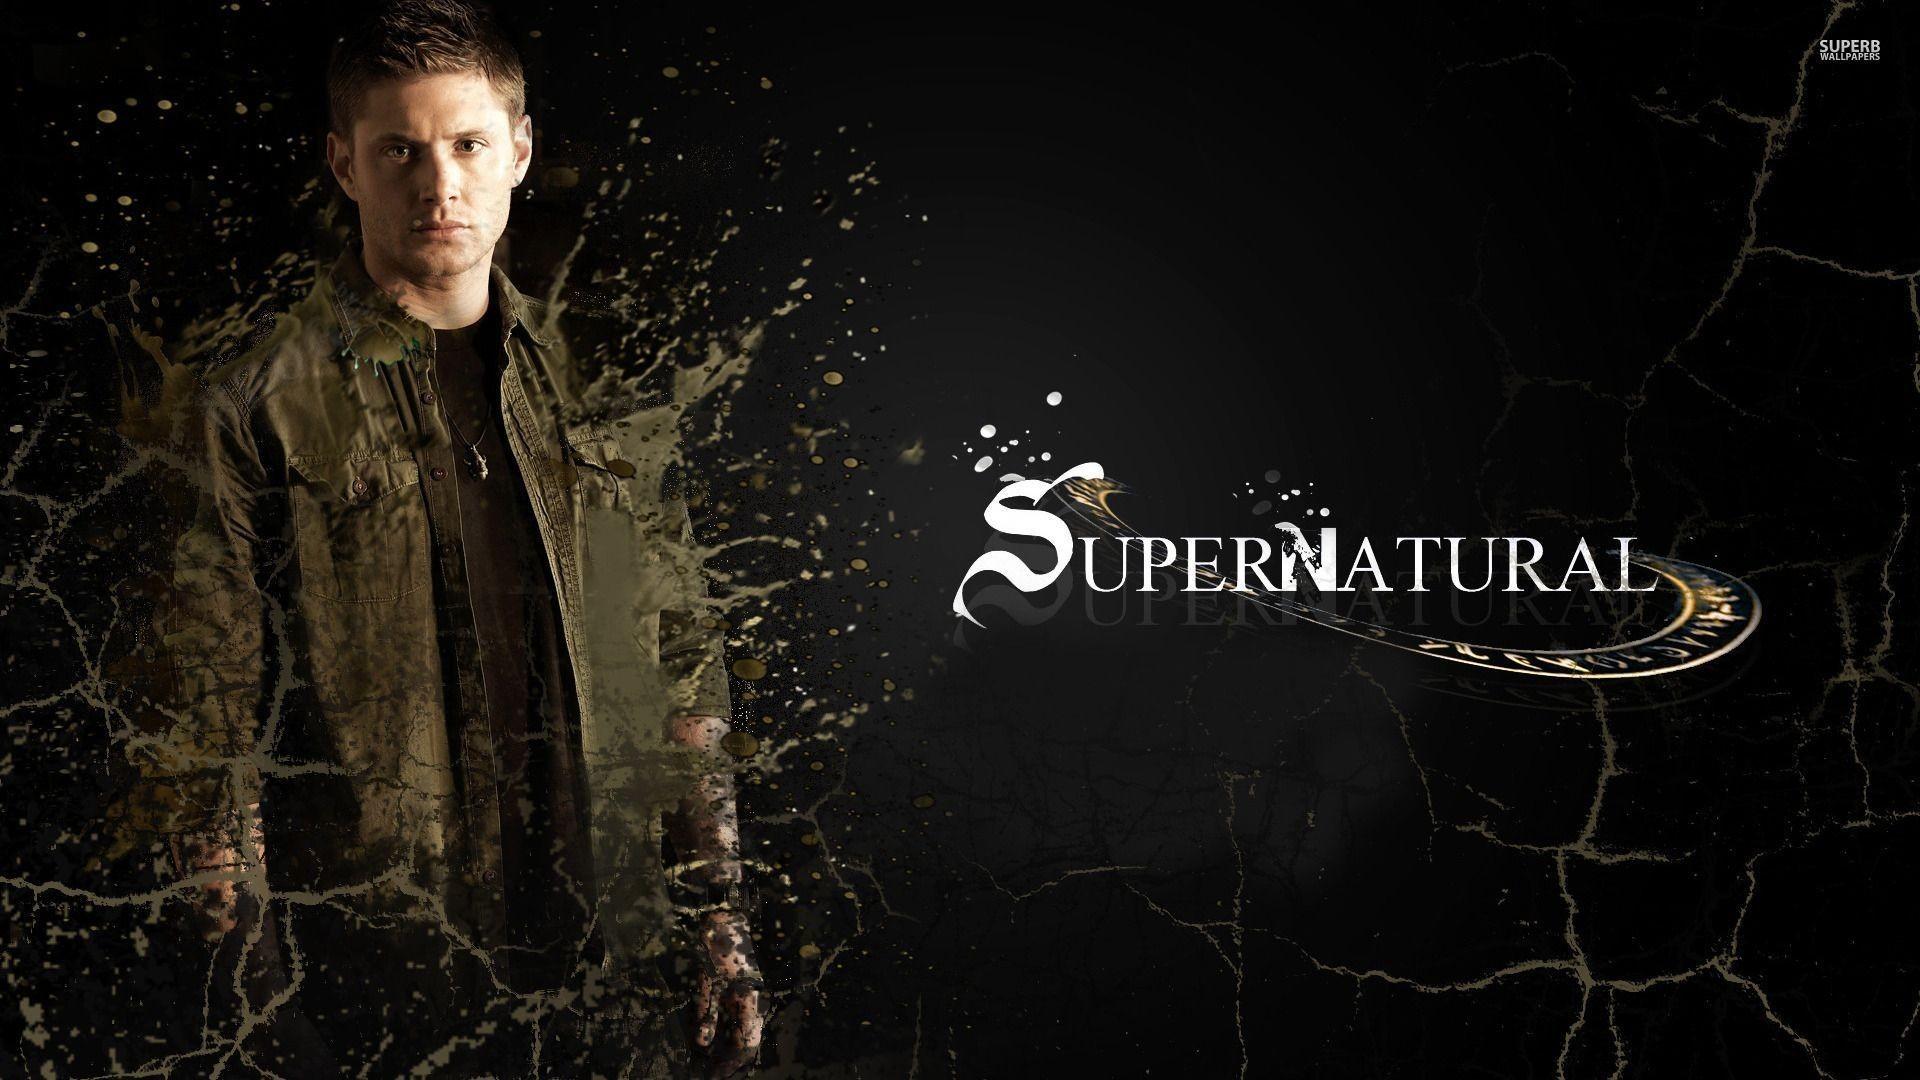 Supernatural wallpaper – TV Show wallpapers – #14972